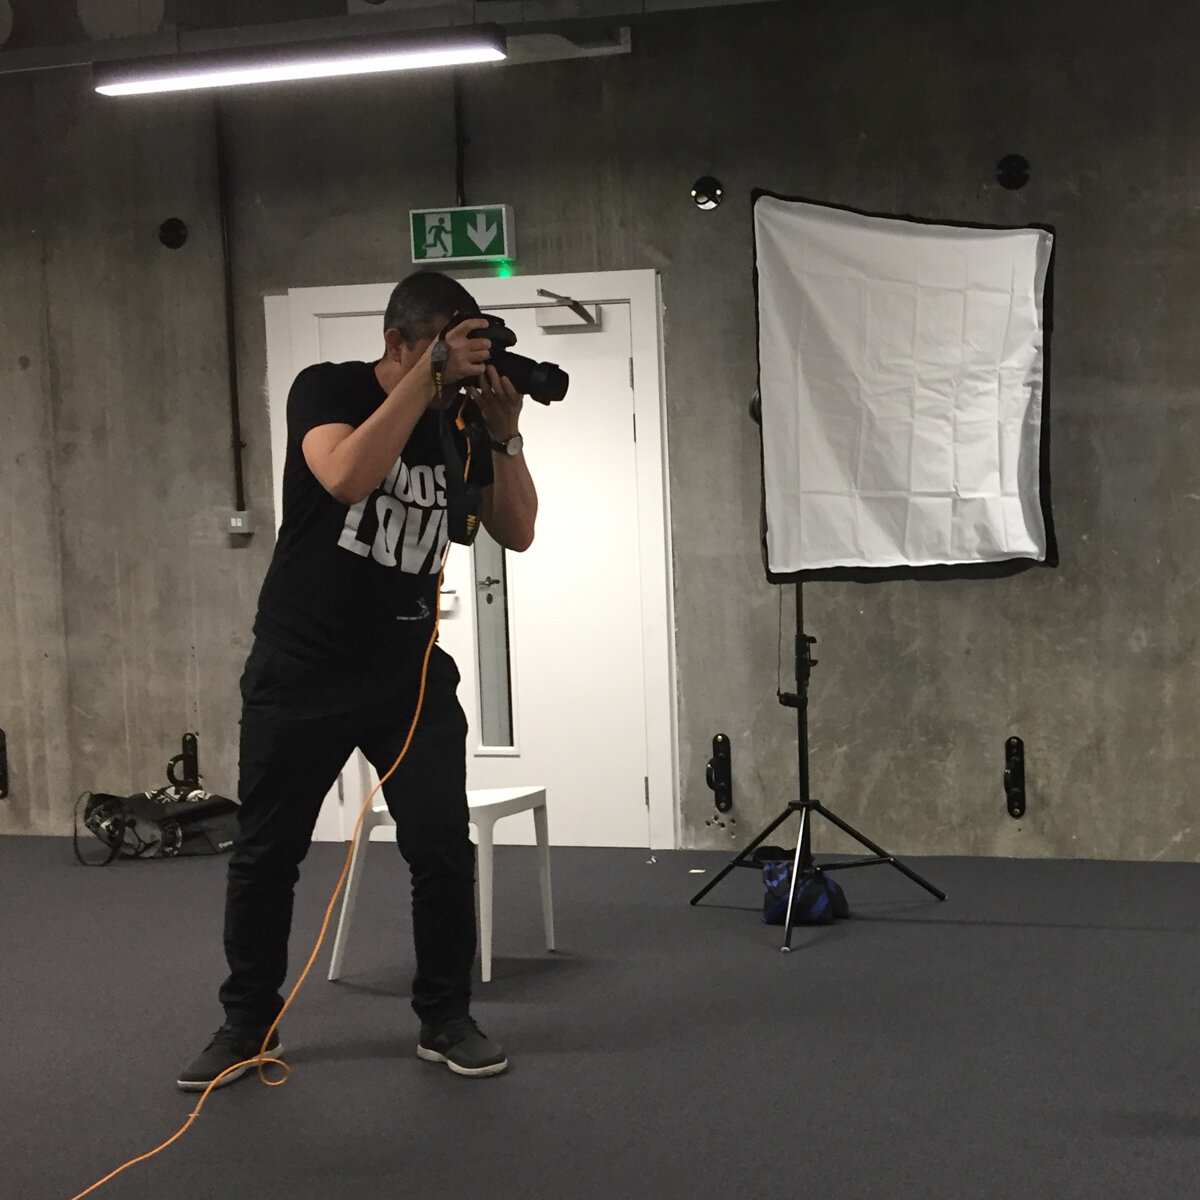 London-photographer-JC-Candanedo-Fashion-Corporate-Portraits-Headshots-Blog-Creative-Industry-London-Starting-Support-Economy-Squarespace.jpg